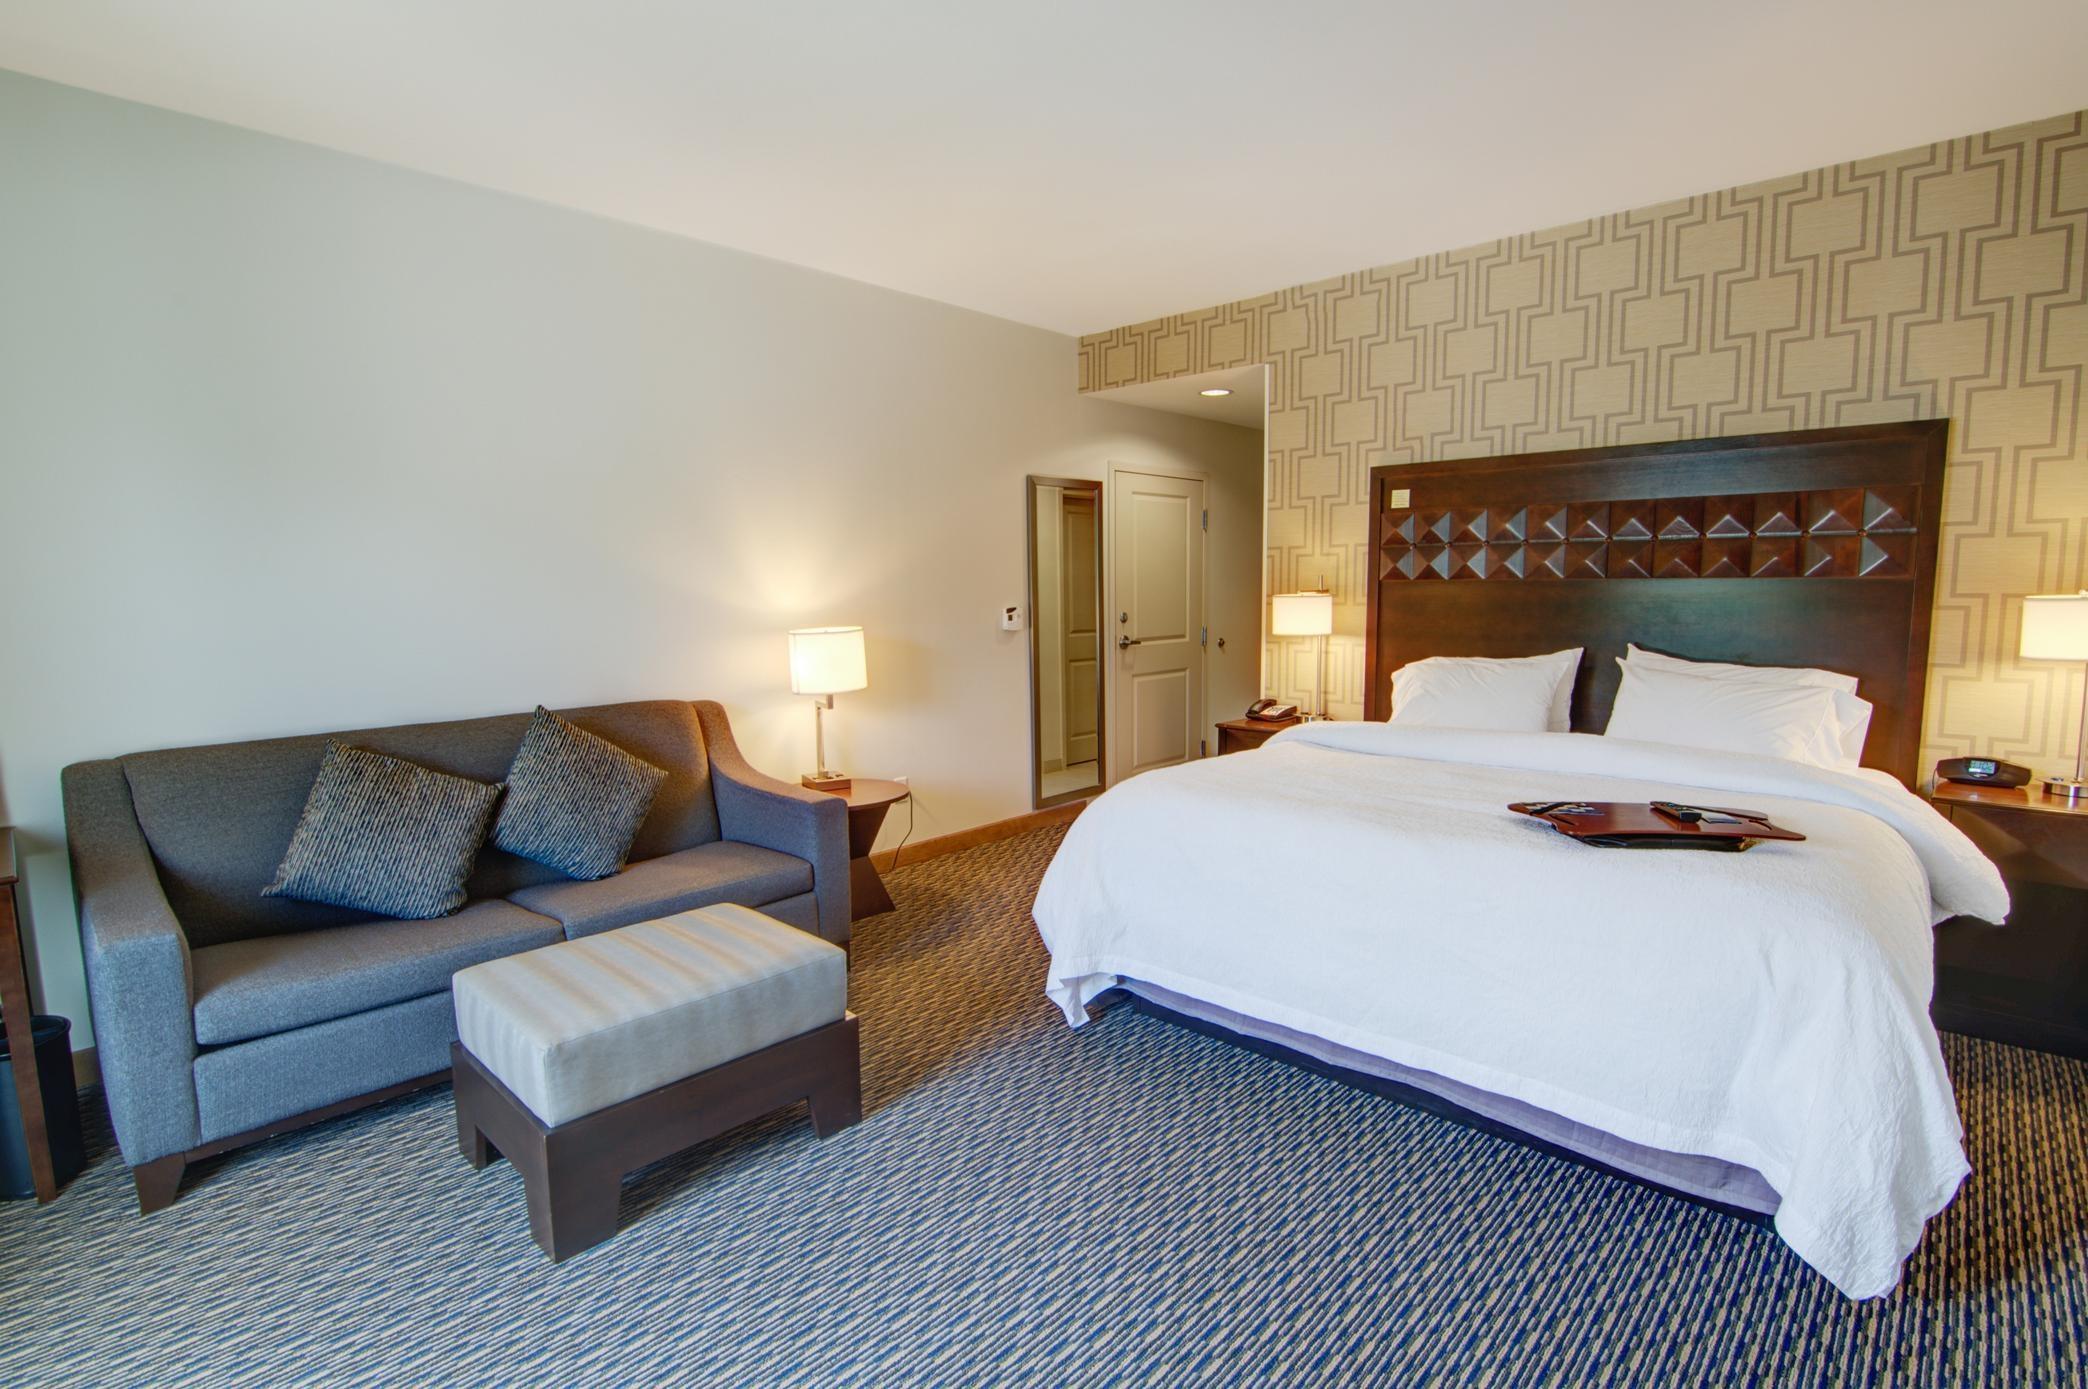 Hampton Inn & Suites Trophy Club - Fort Worth North image 10